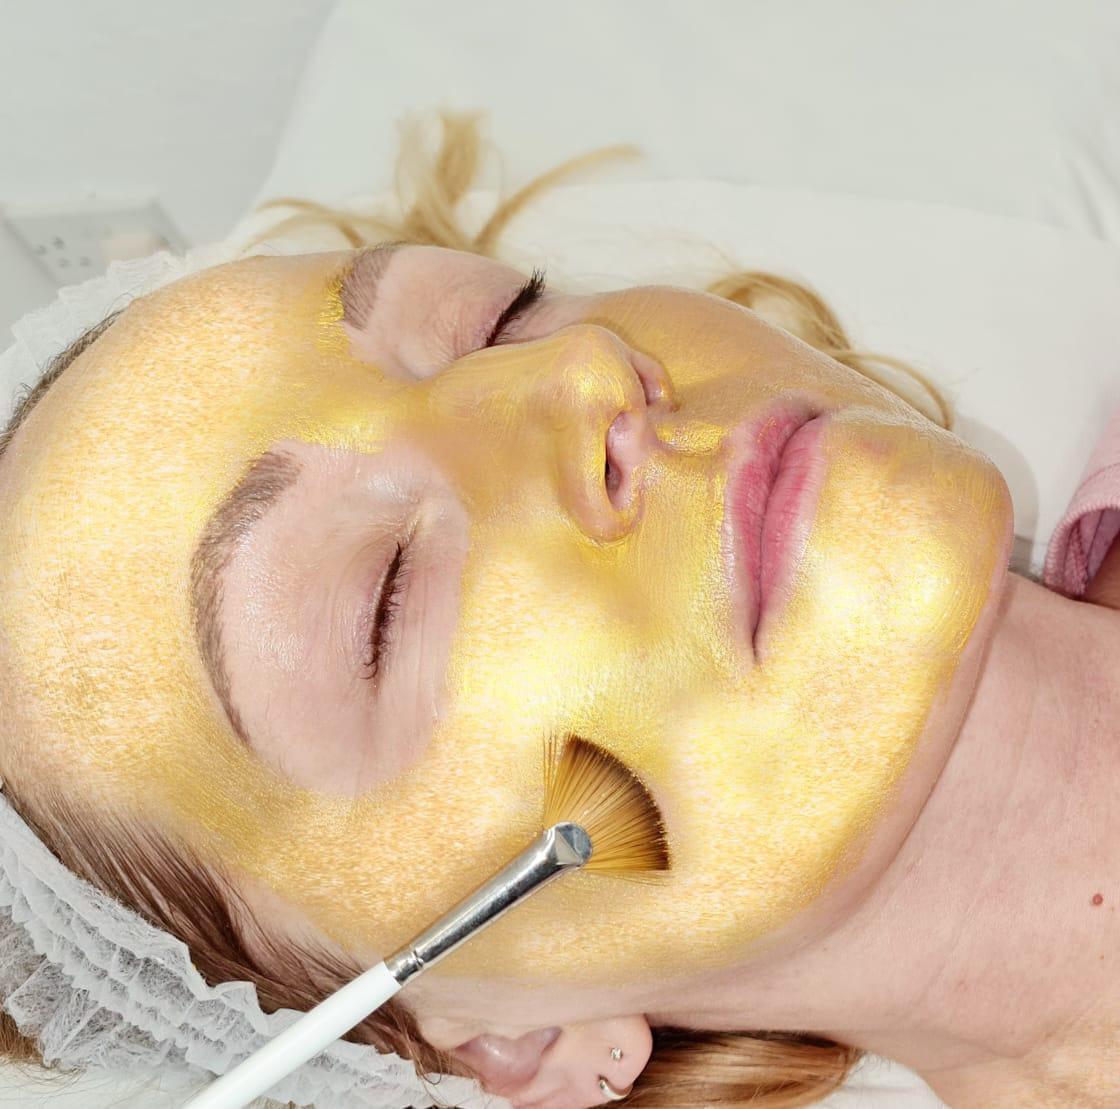 gold-treatment-img-1